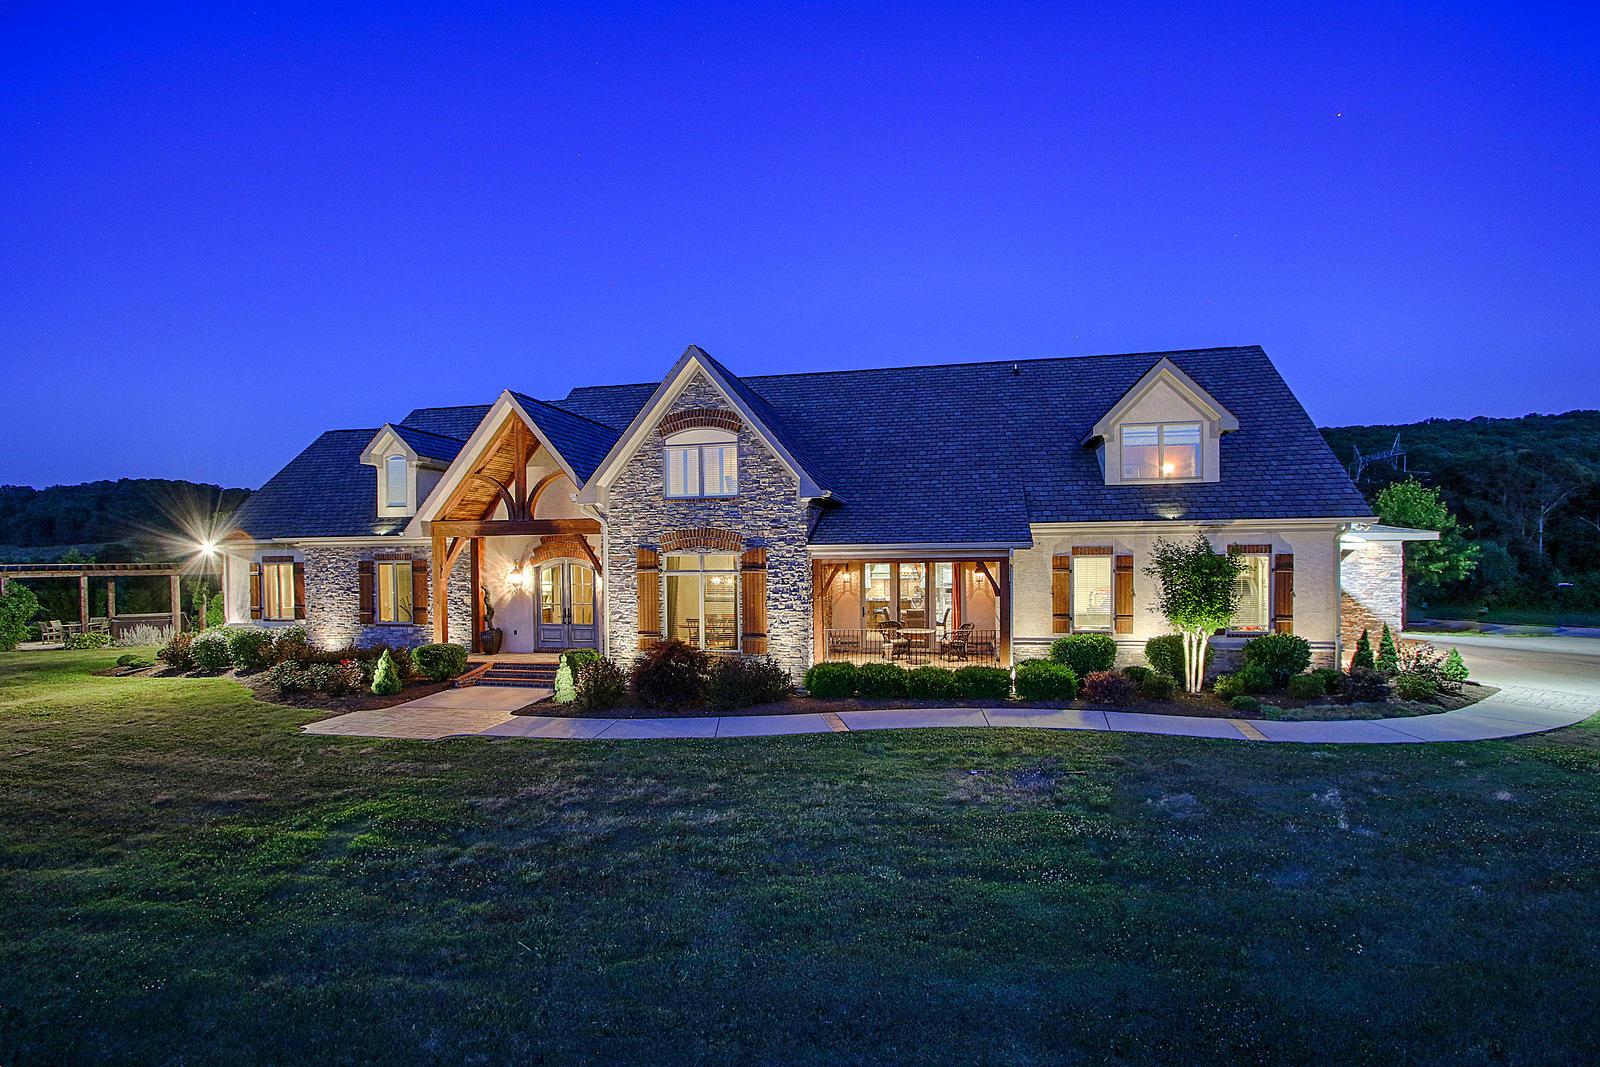 12568 Birchwood Pike, Harrison, TN 37341